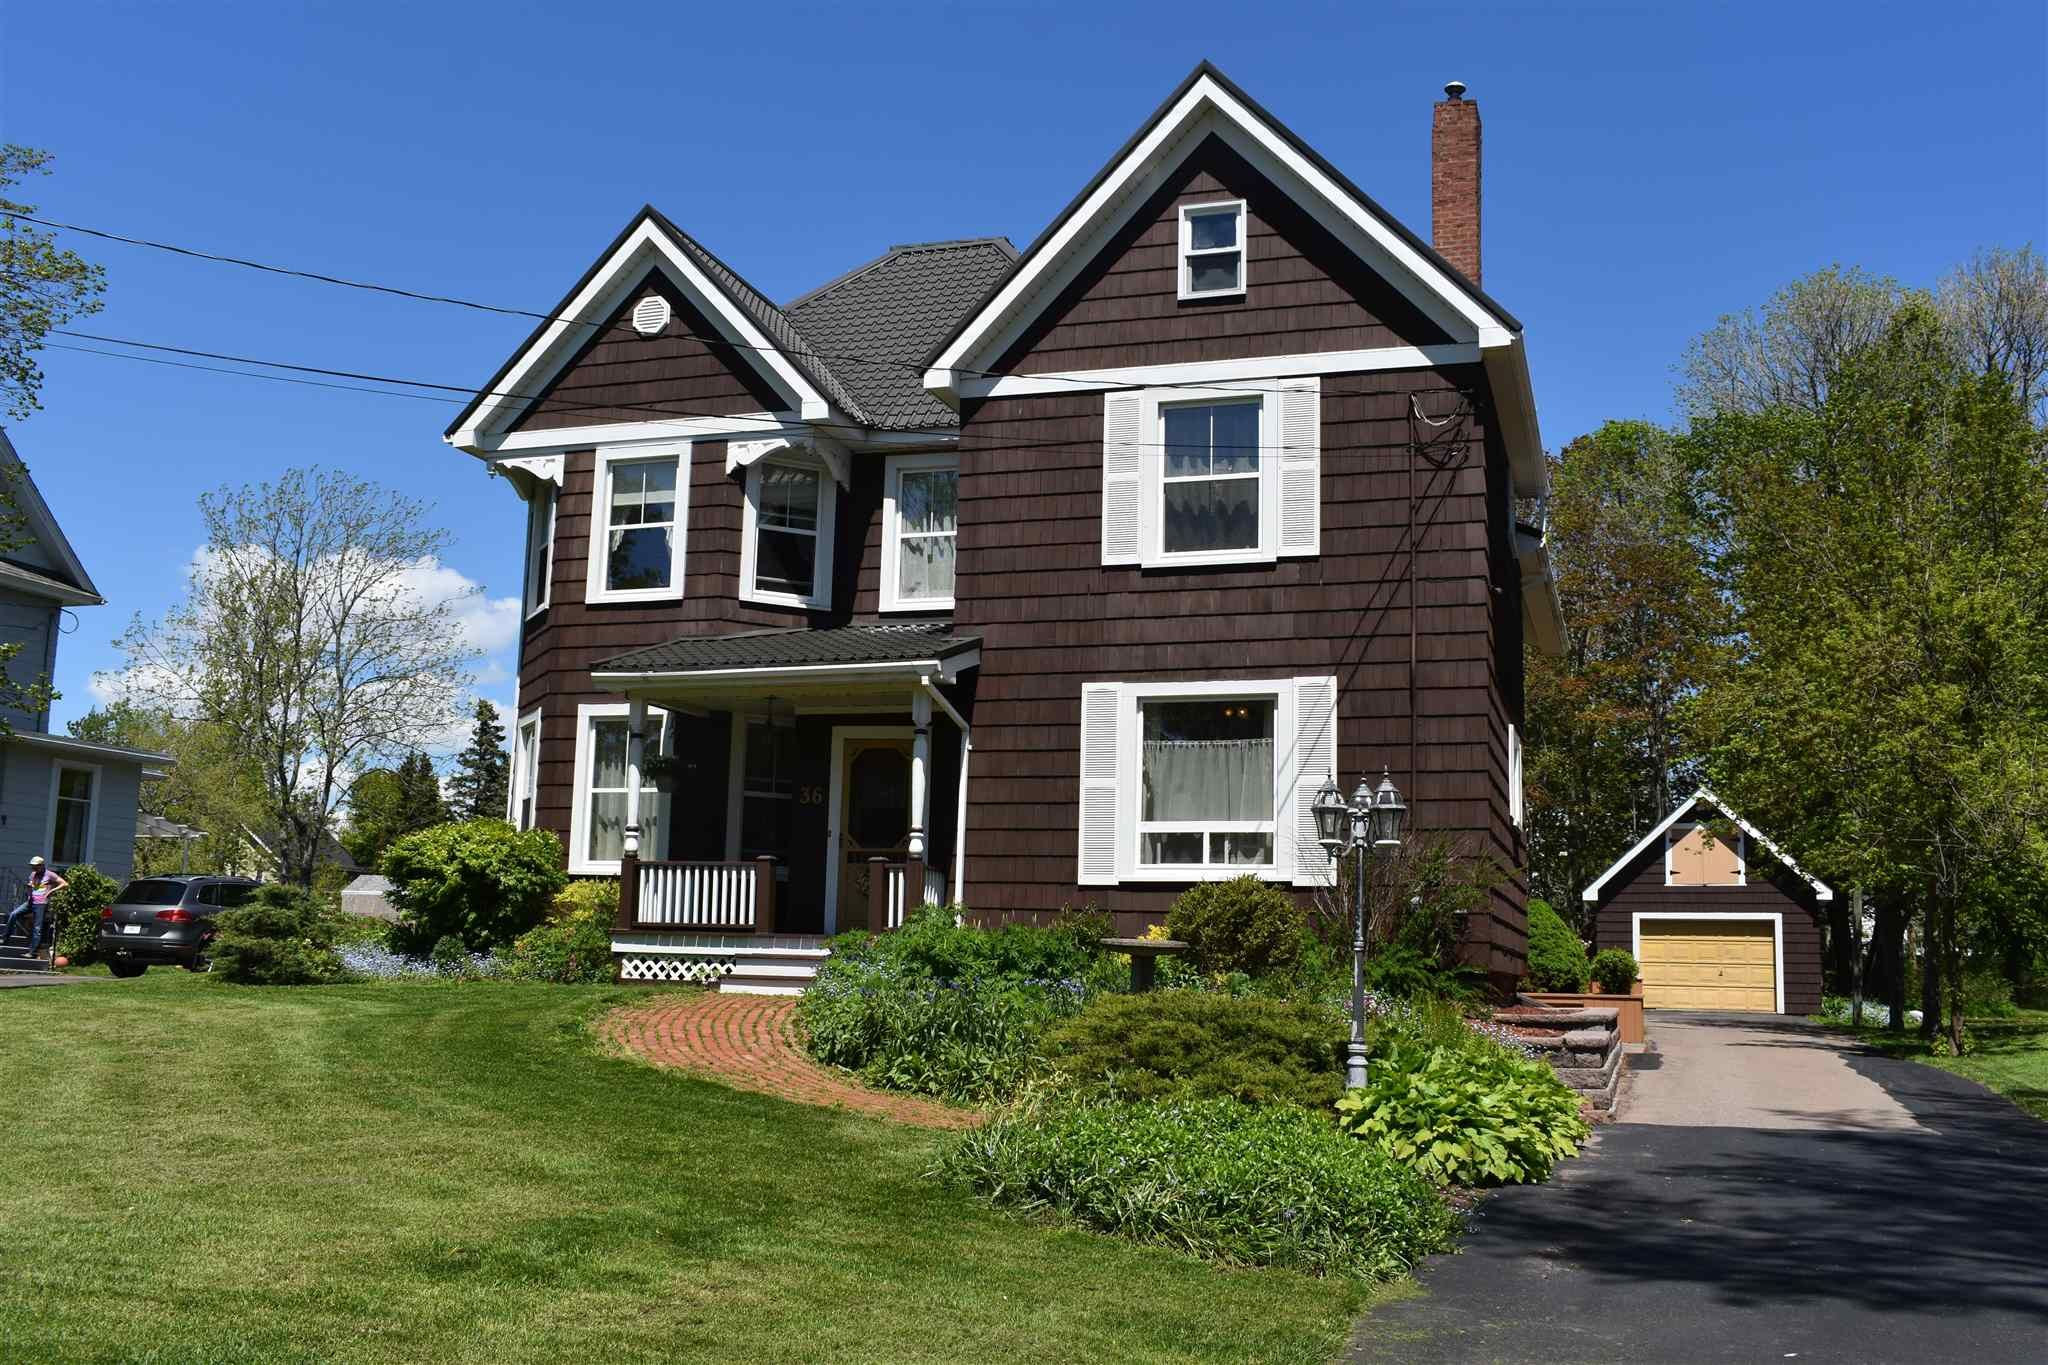 Main Photo: 36 Rupert Street in Amherst: 101-Amherst,Brookdale,Warren Residential for sale (Northern Region)  : MLS®# 202113795